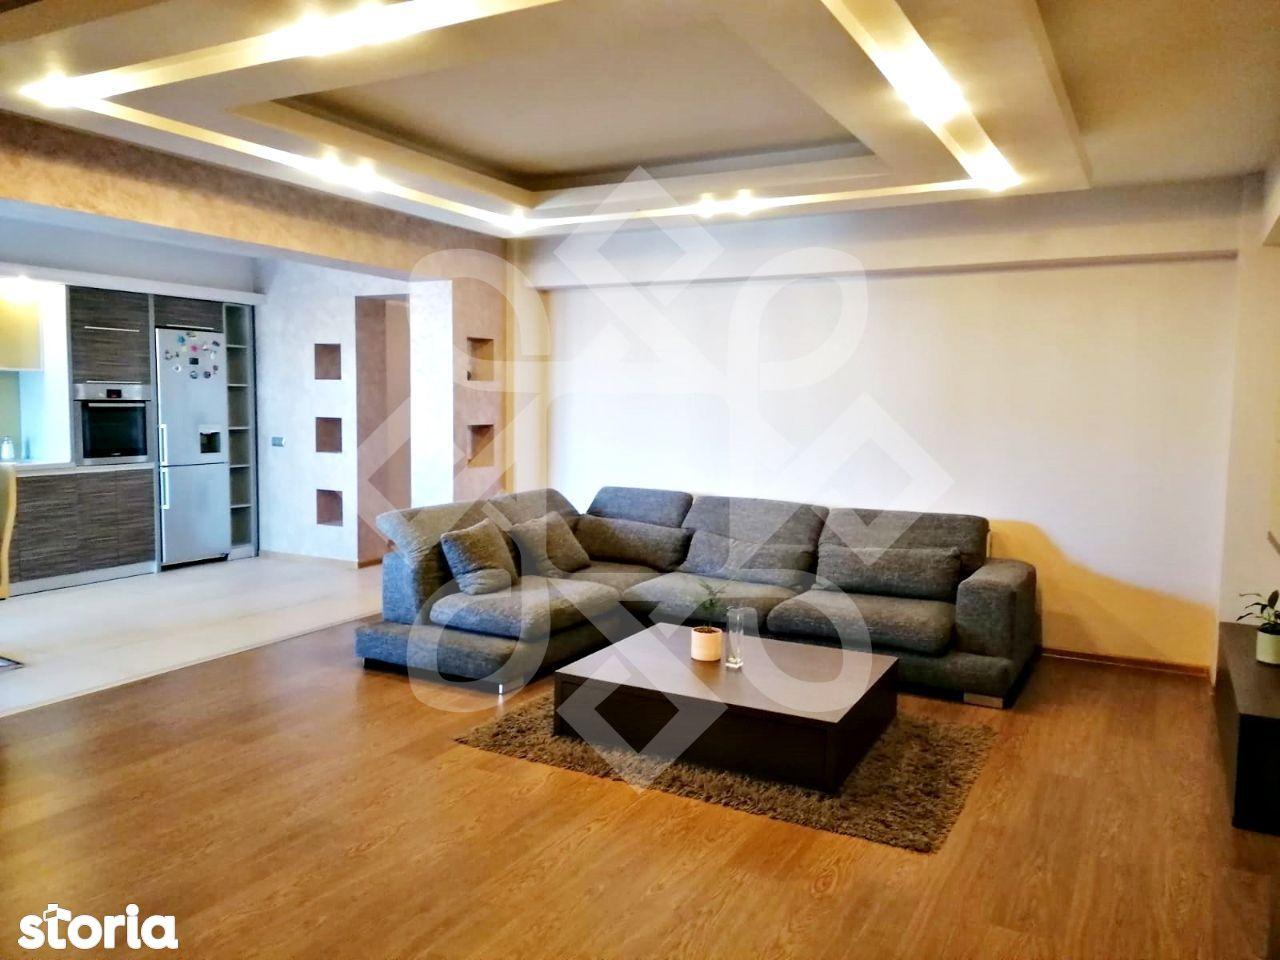 Apartament trei camere de vanzare, Nufarul Plaza, Oradea AV084